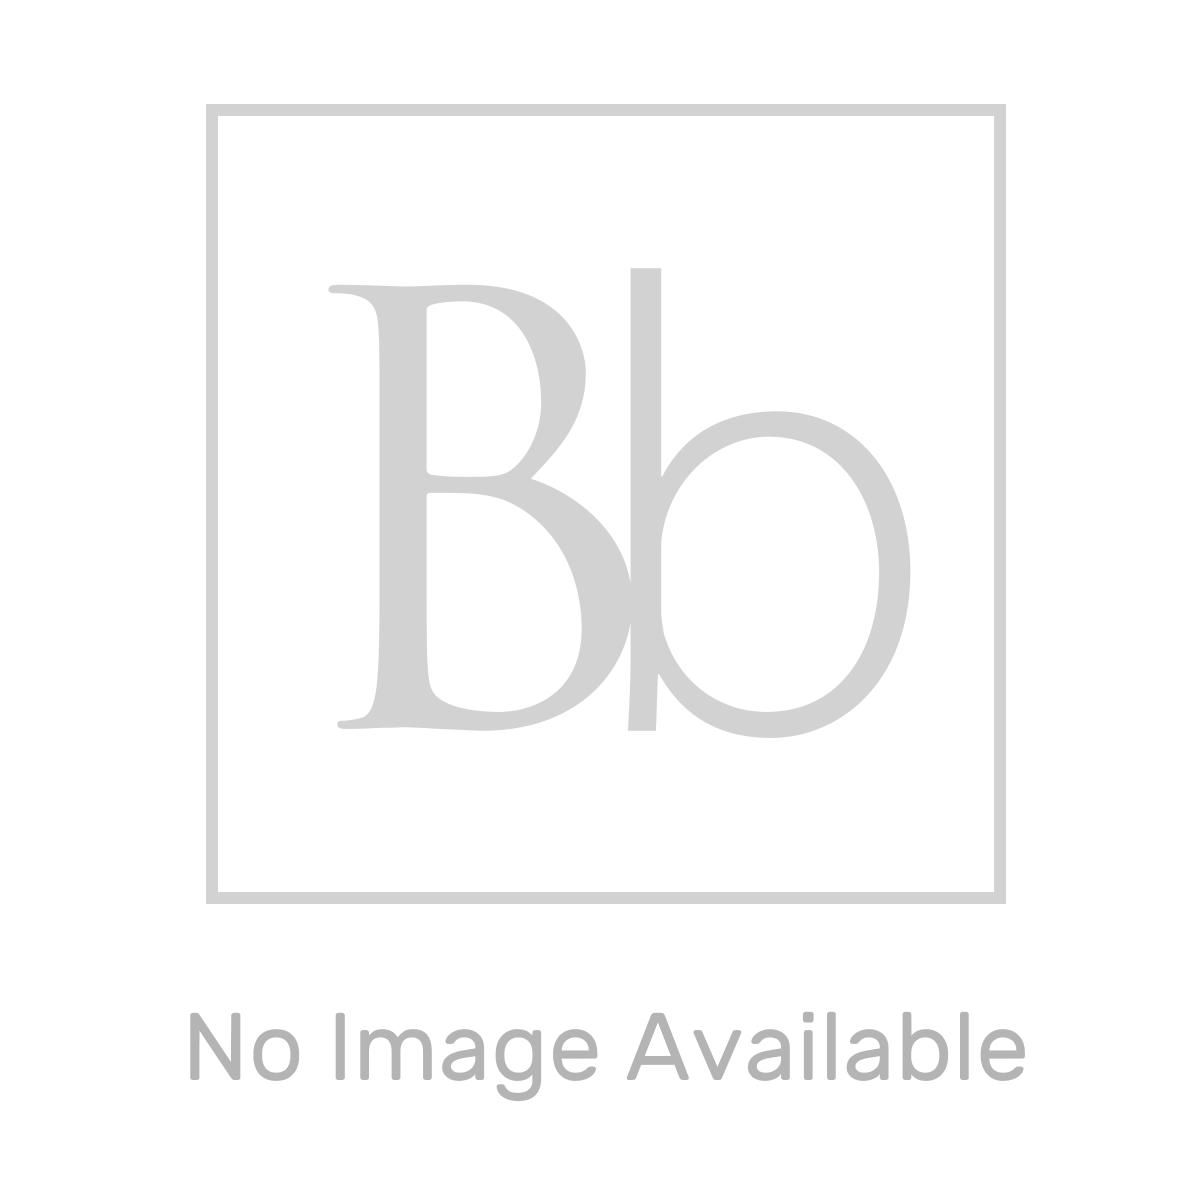 Frontline Alex Designer Heated Towel Rail 760 x 500mm Dimensions